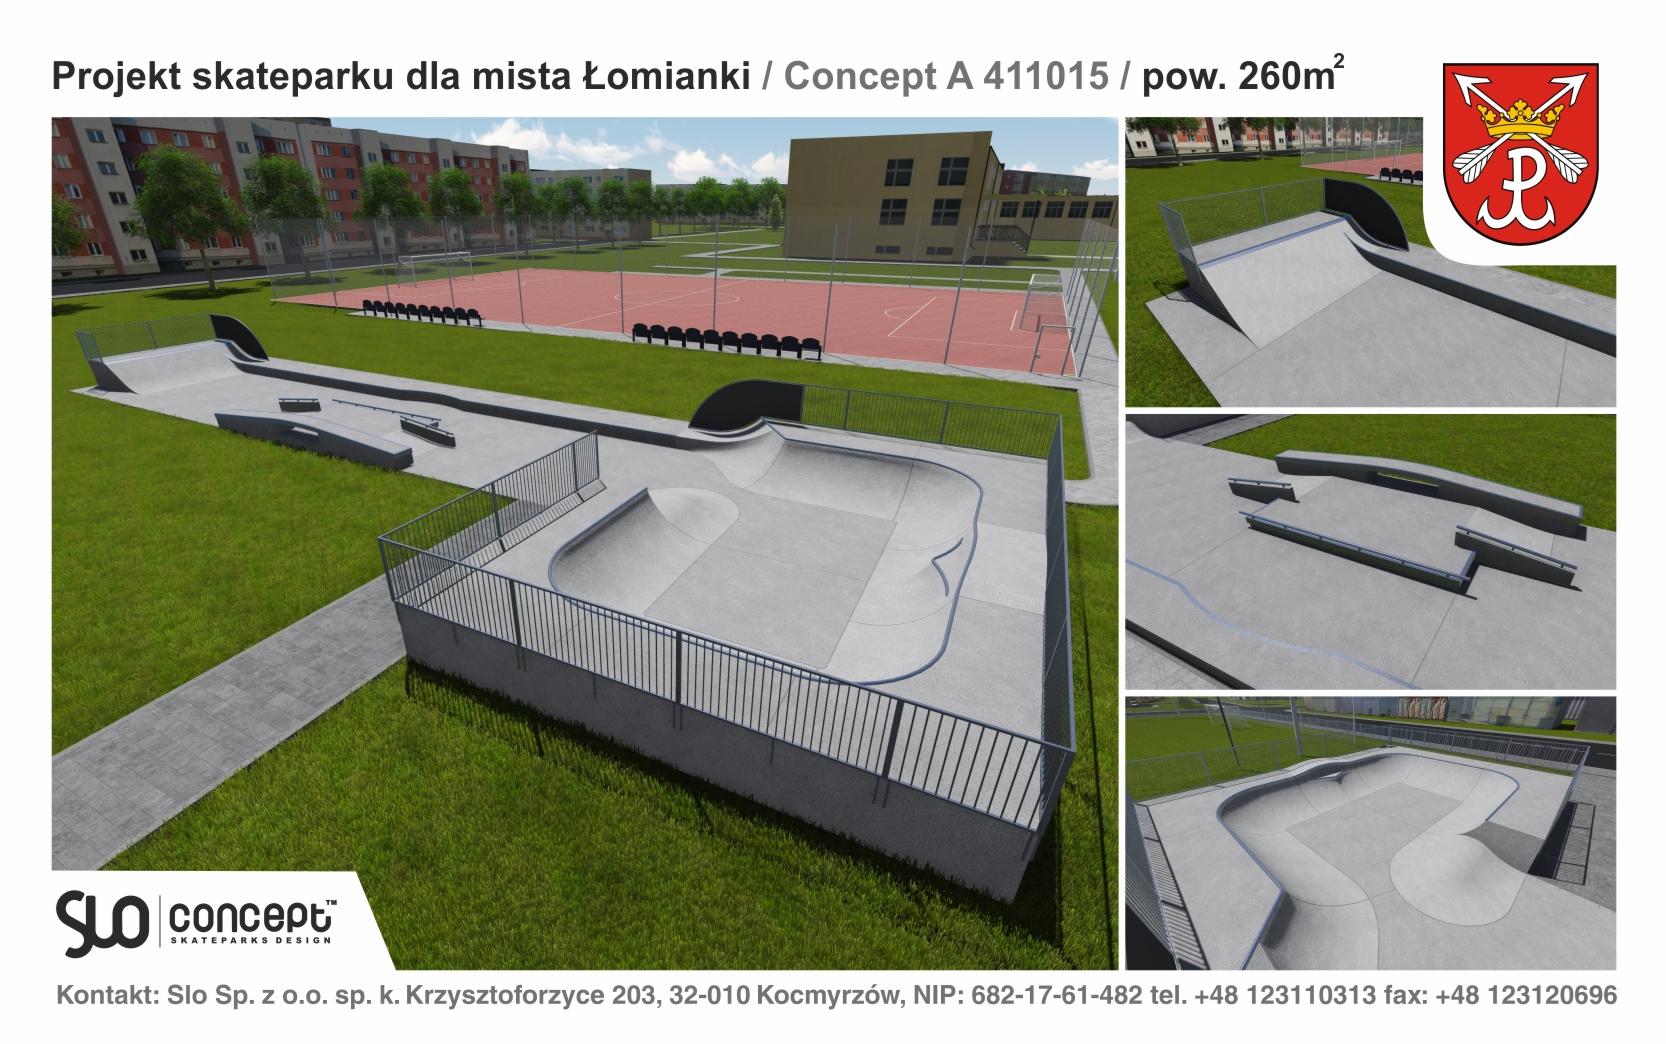 Skateprk Łomiaki